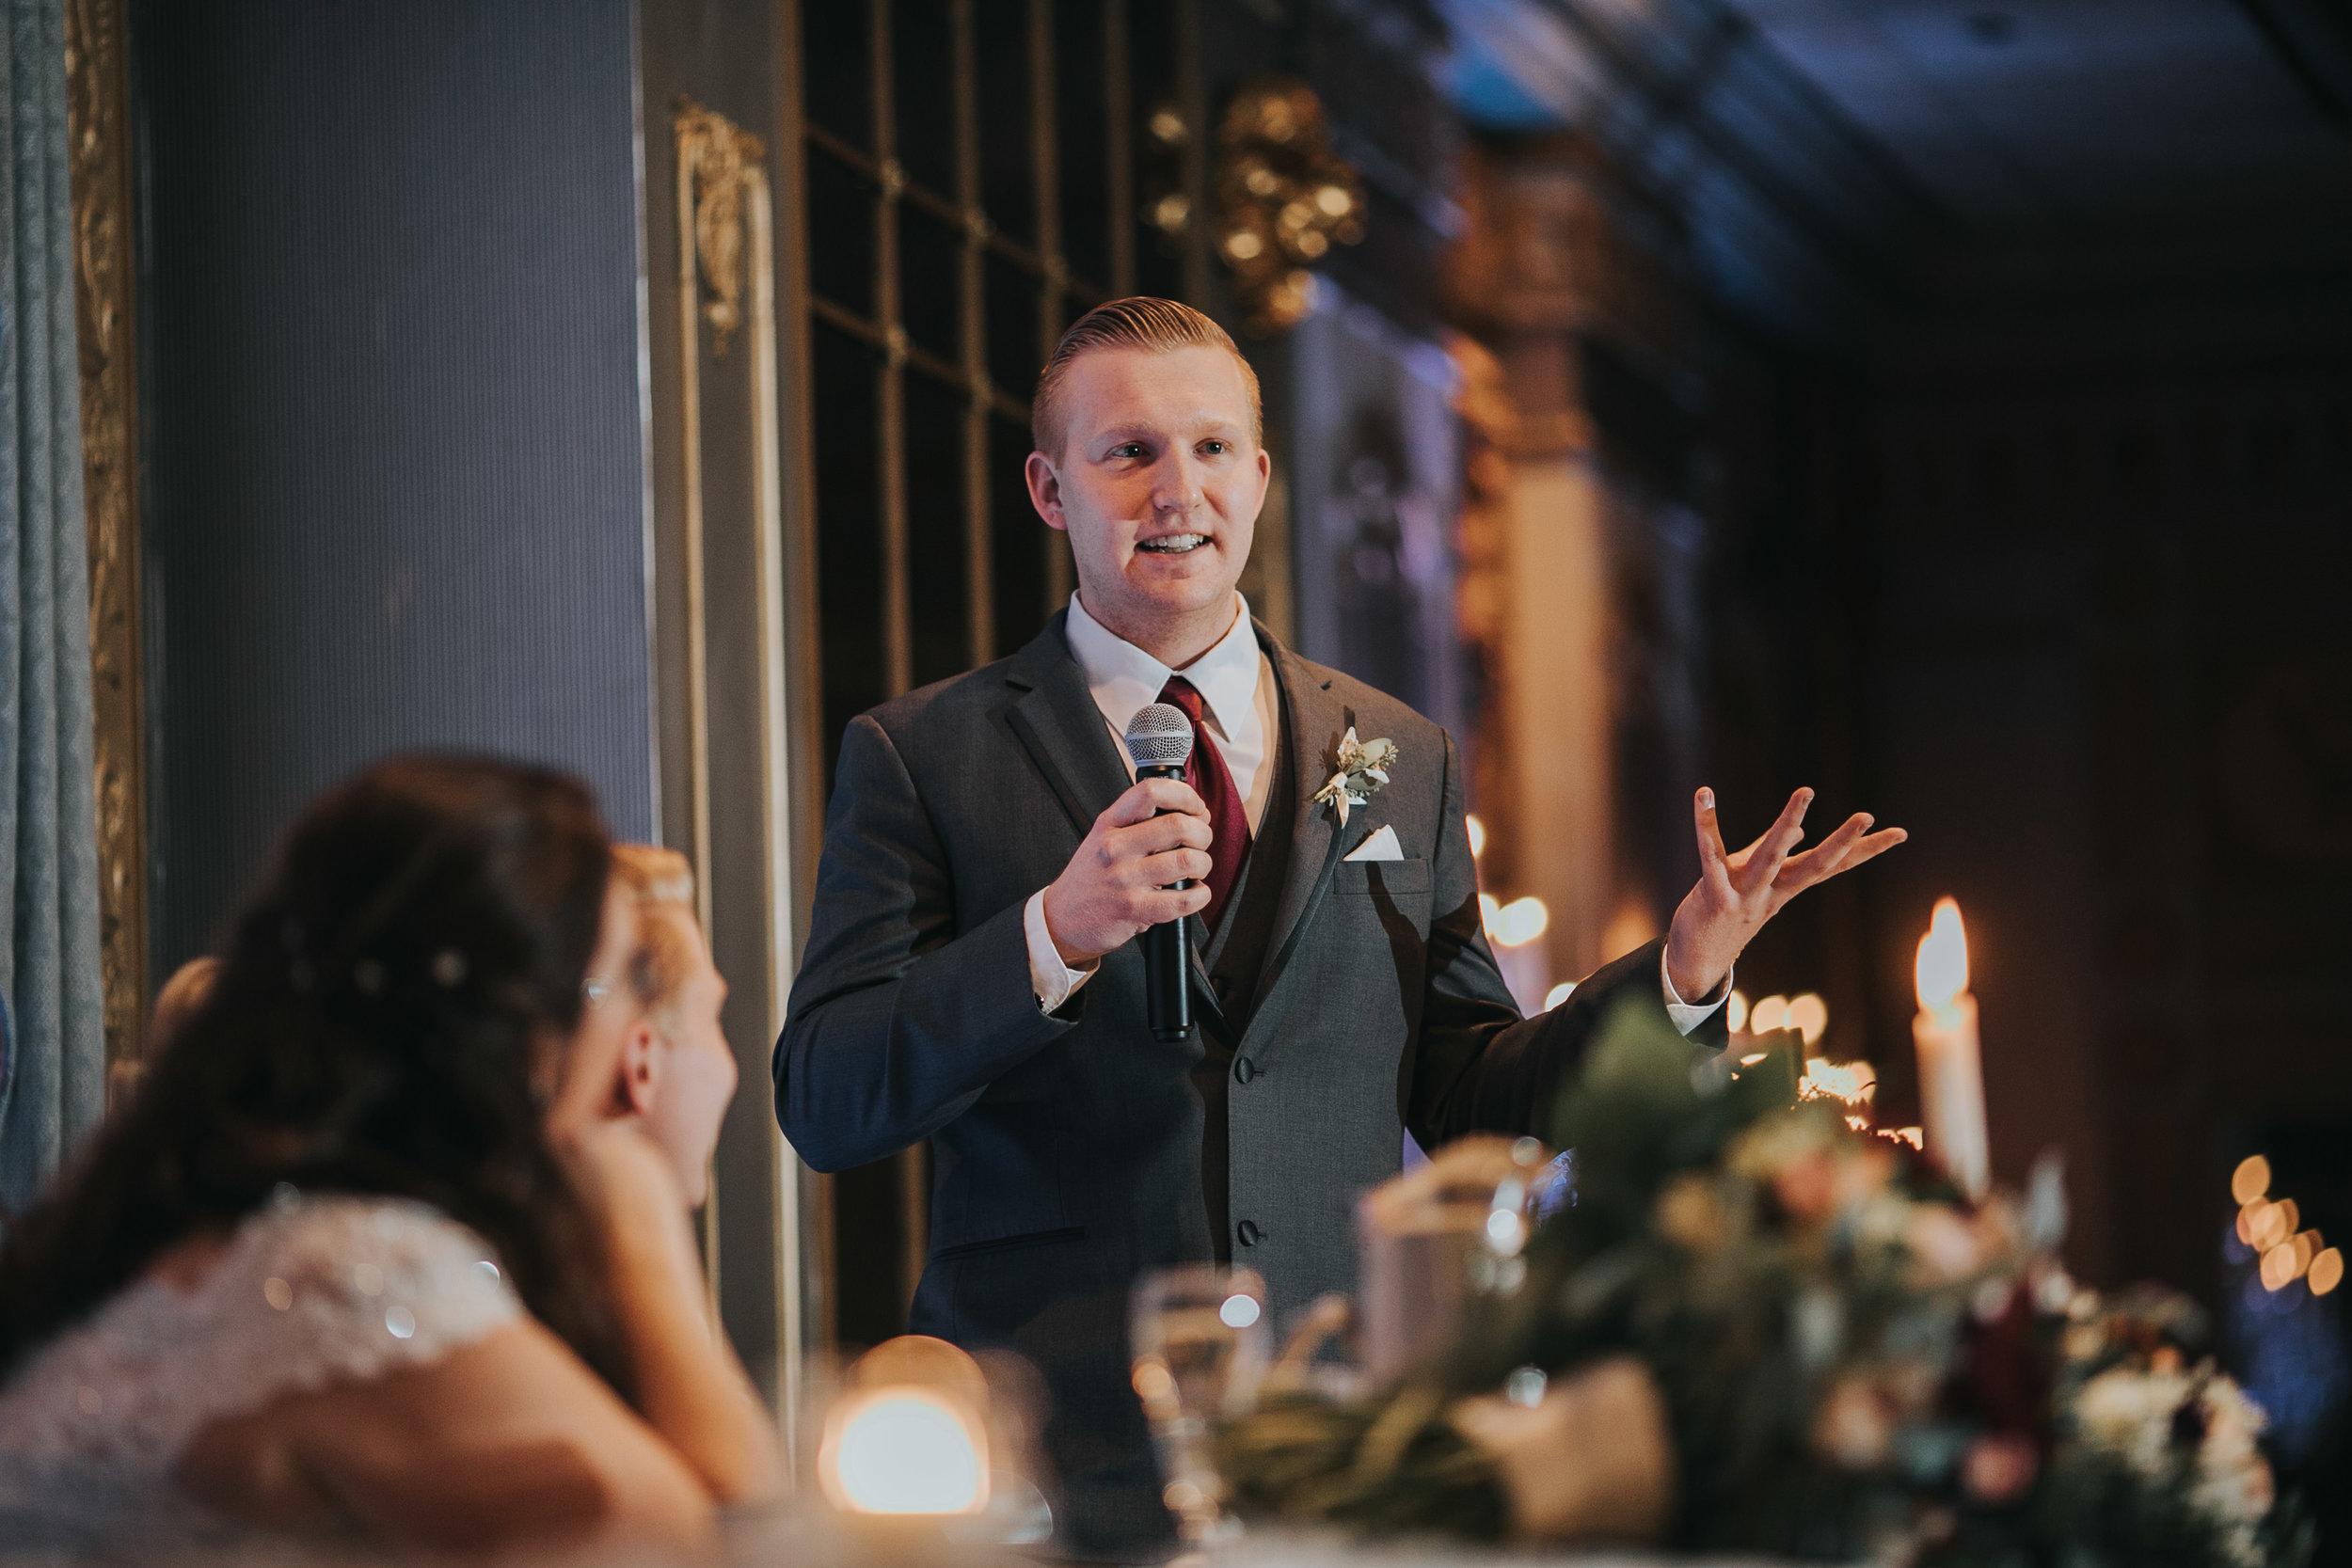 New-Jersey-Wedding-Photography-Fishers-Tudor-House-JennaLynnPhotography-Reception-Kathleen&Eddie-151.jpg